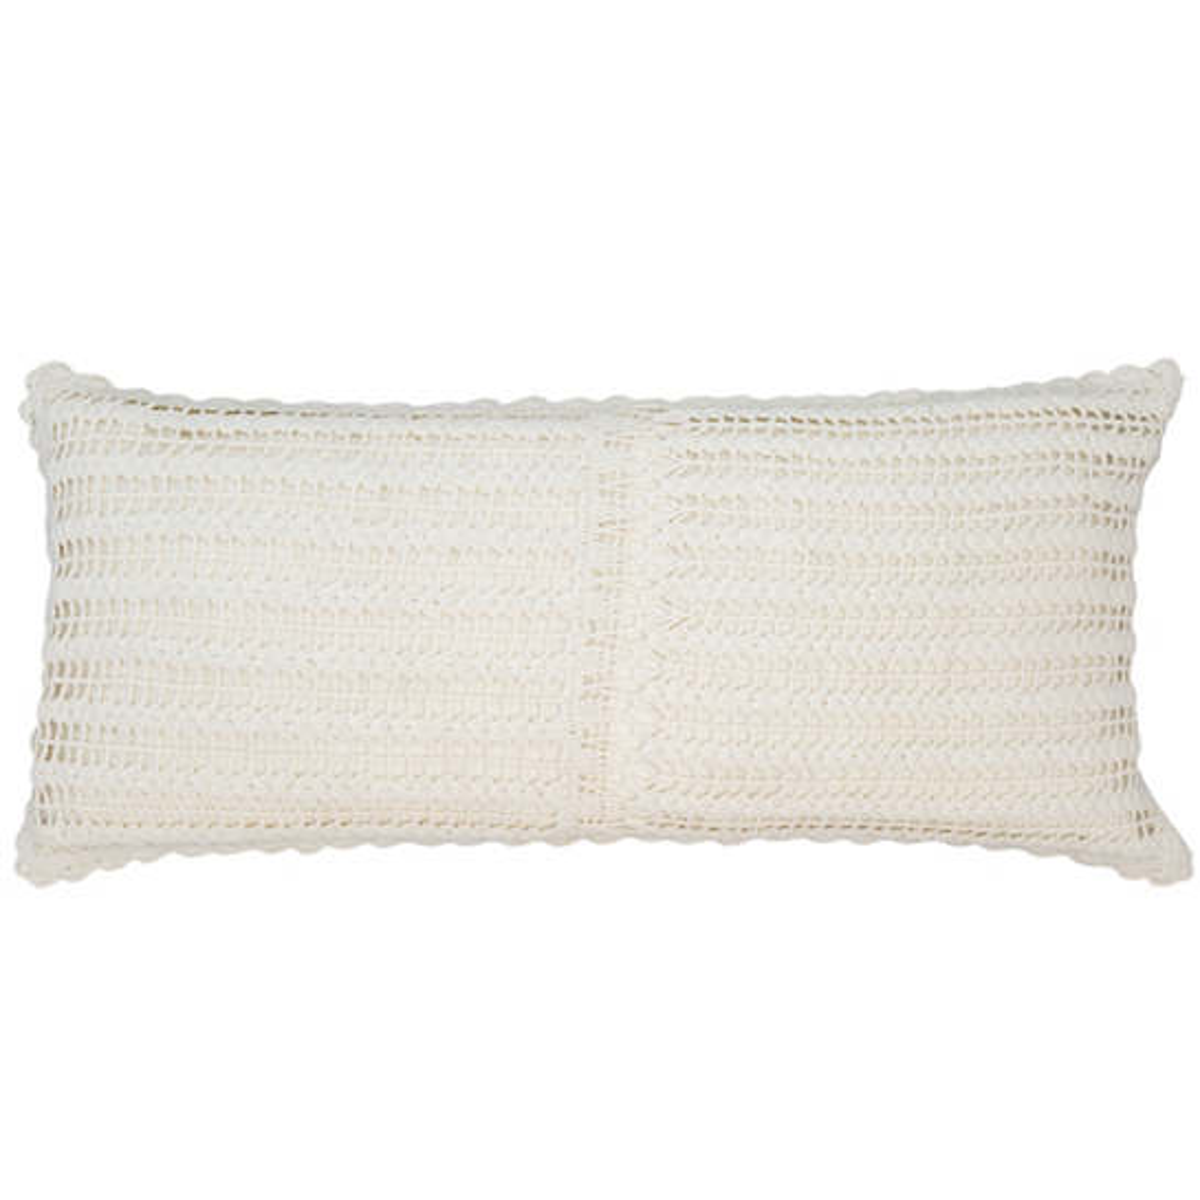 Marigot Crochet Ivory Decorative Pillow